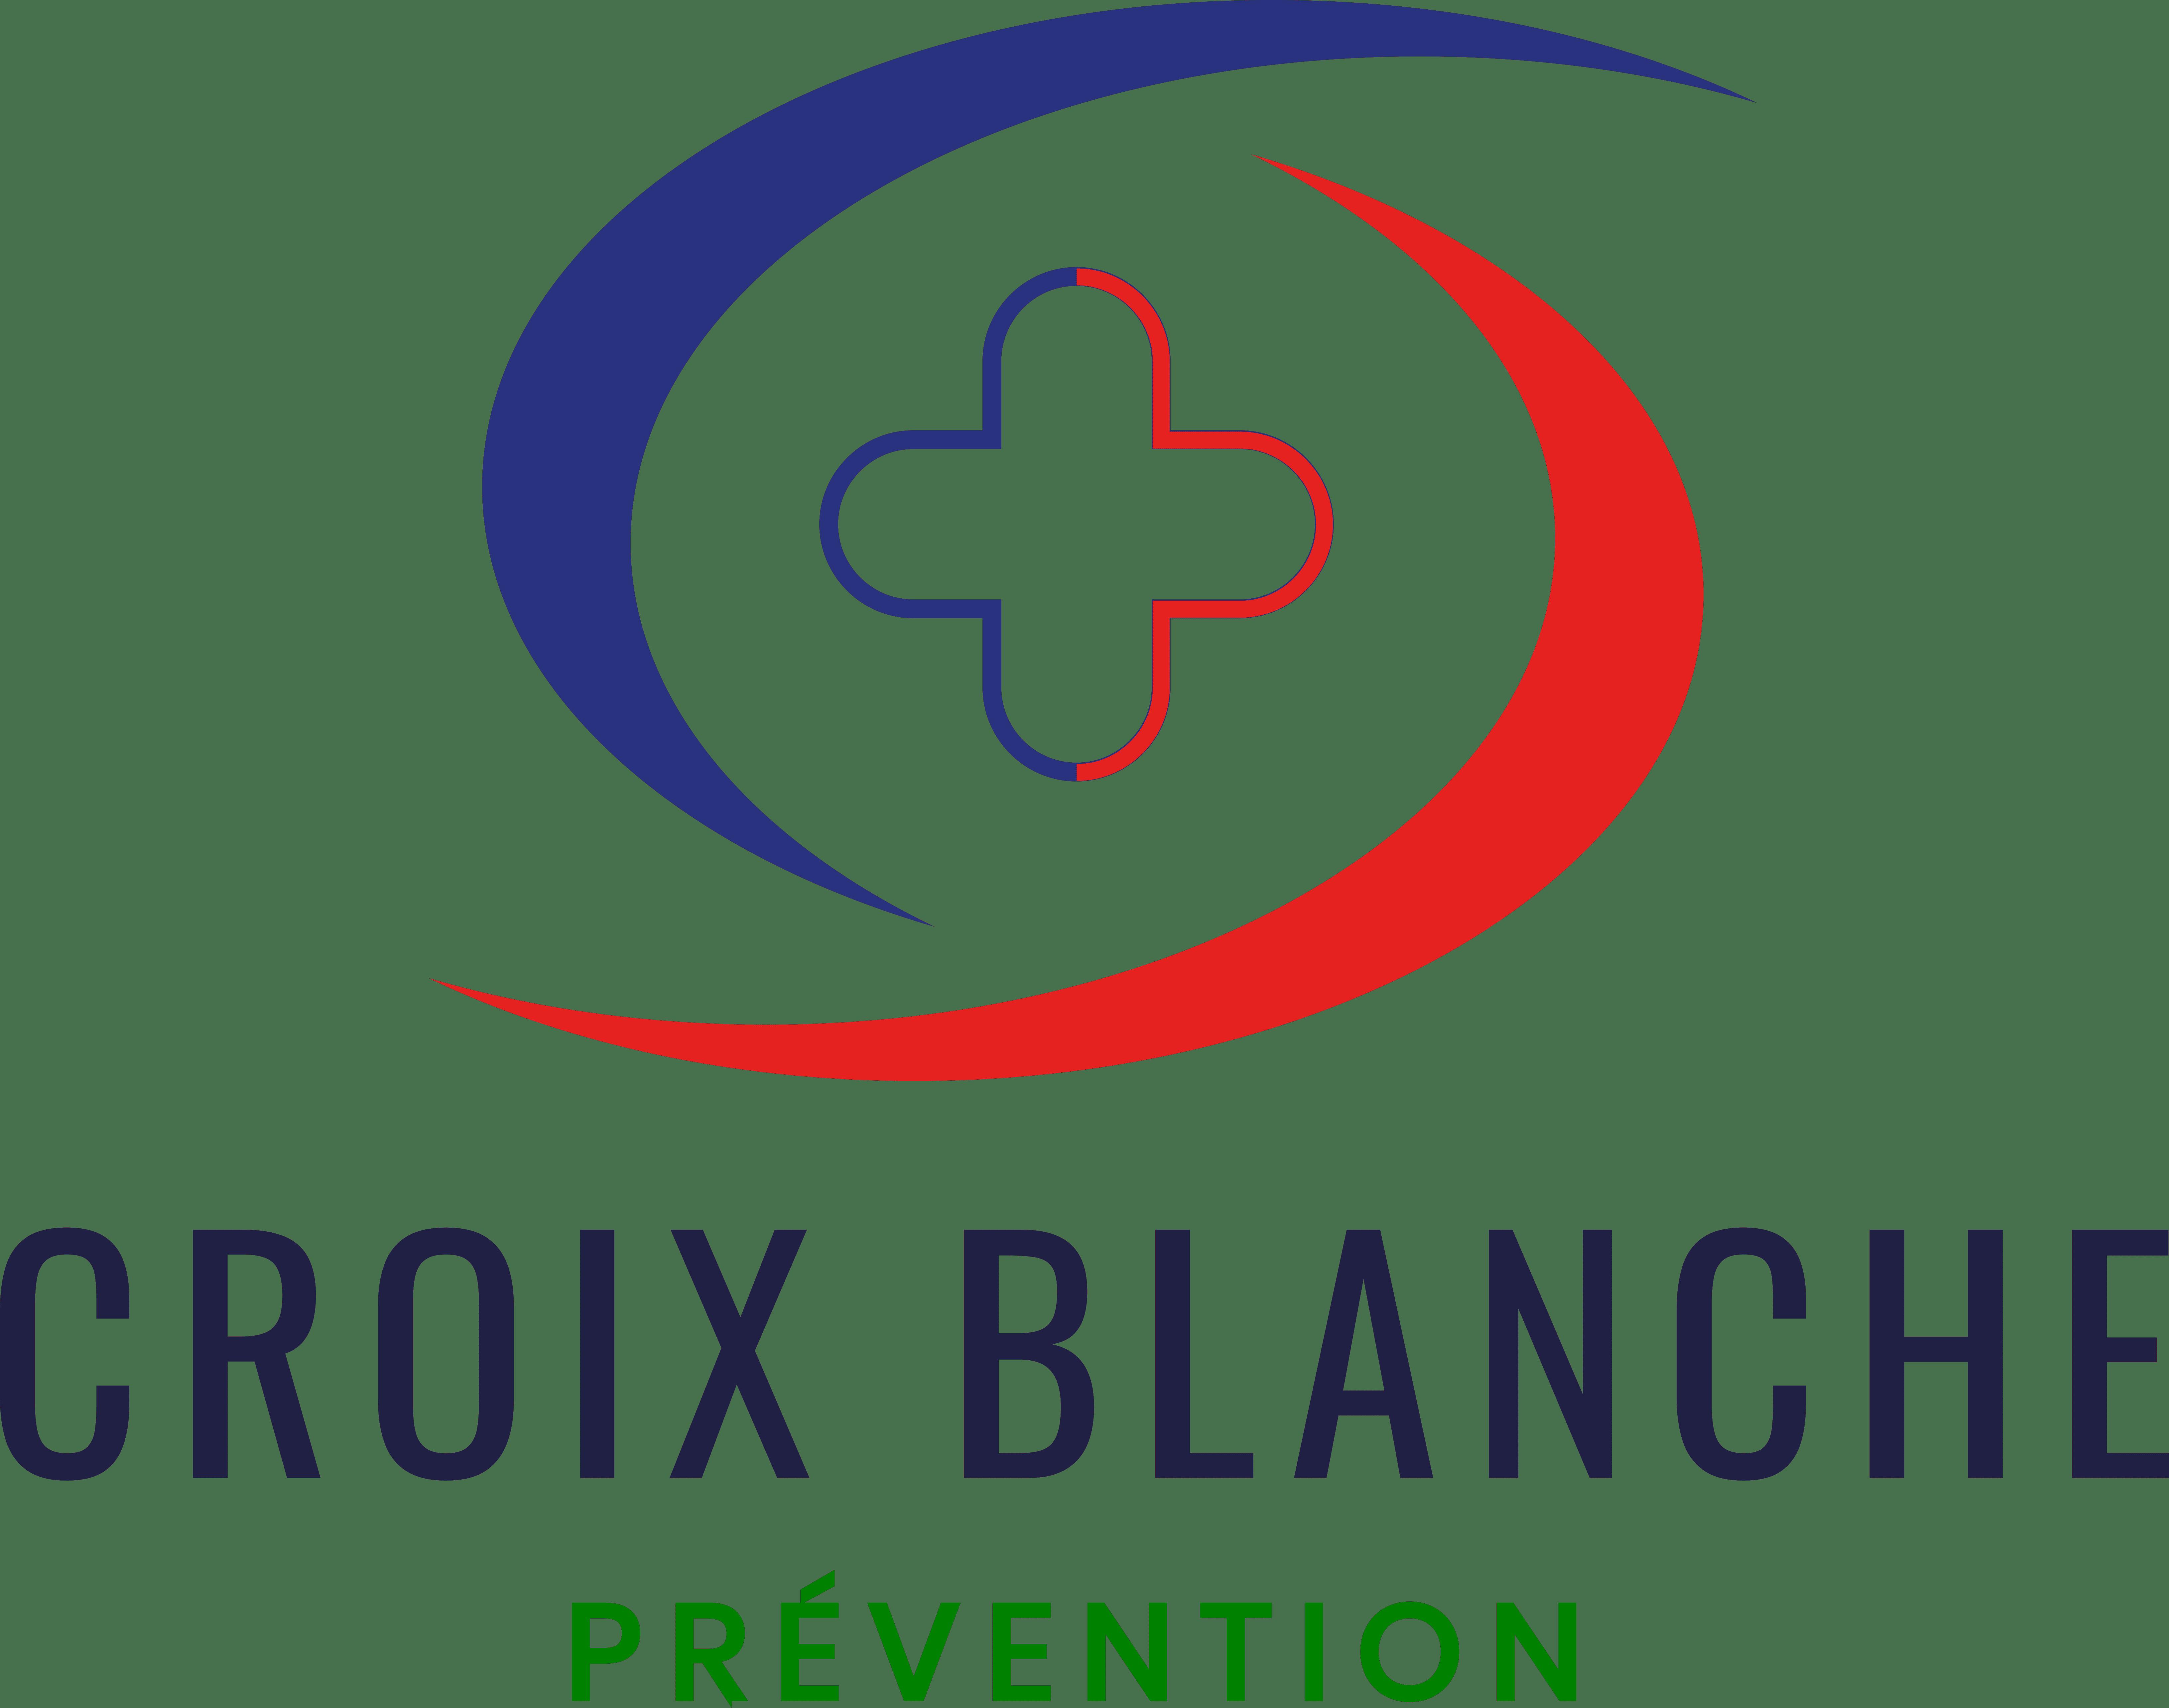 croix-blanche-prevention-incendie